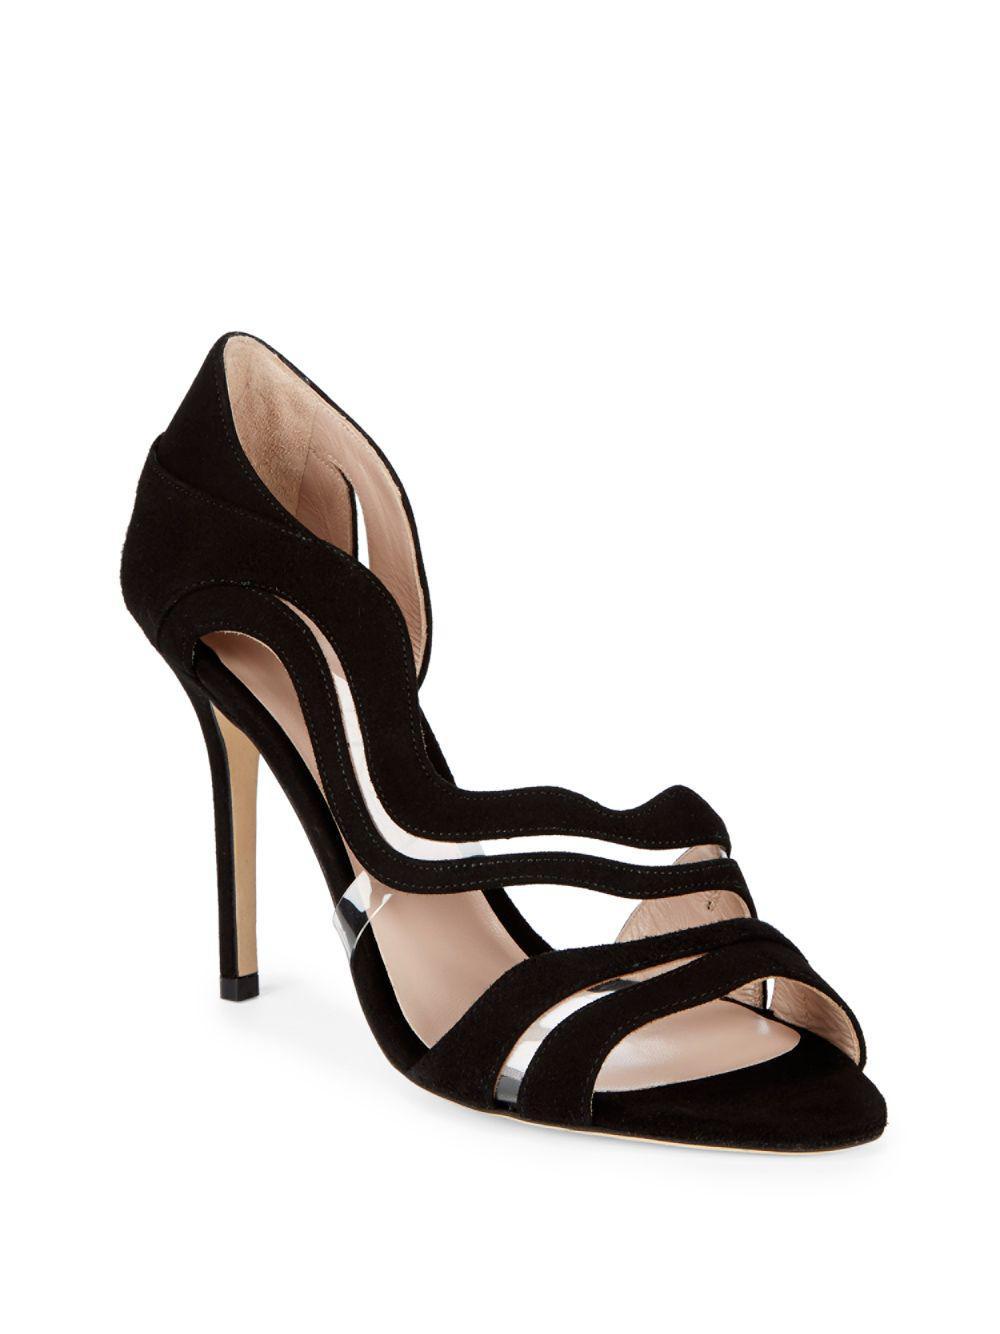 Aperlai Cutout Slingback Sandals best cheap price buy cheap largest supplier the cheapest cheap online vMdZjCxZd